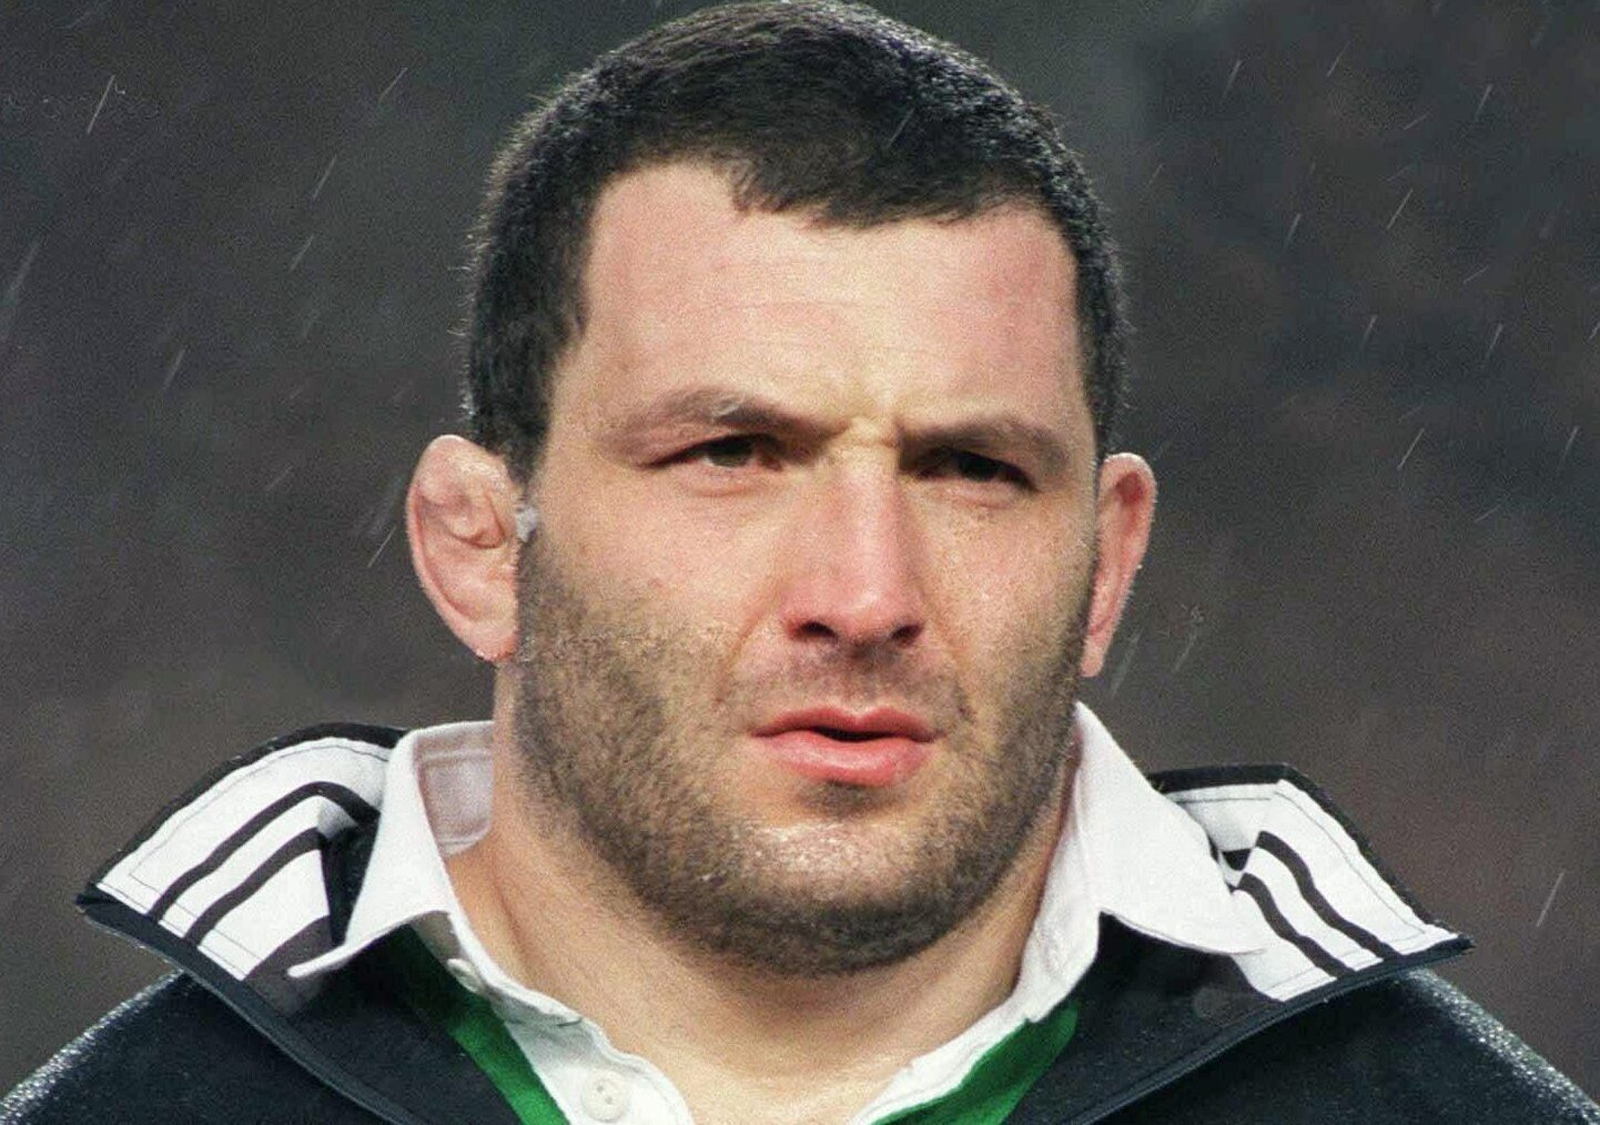 Image - Nick Popplewell scored Ireland's opening try